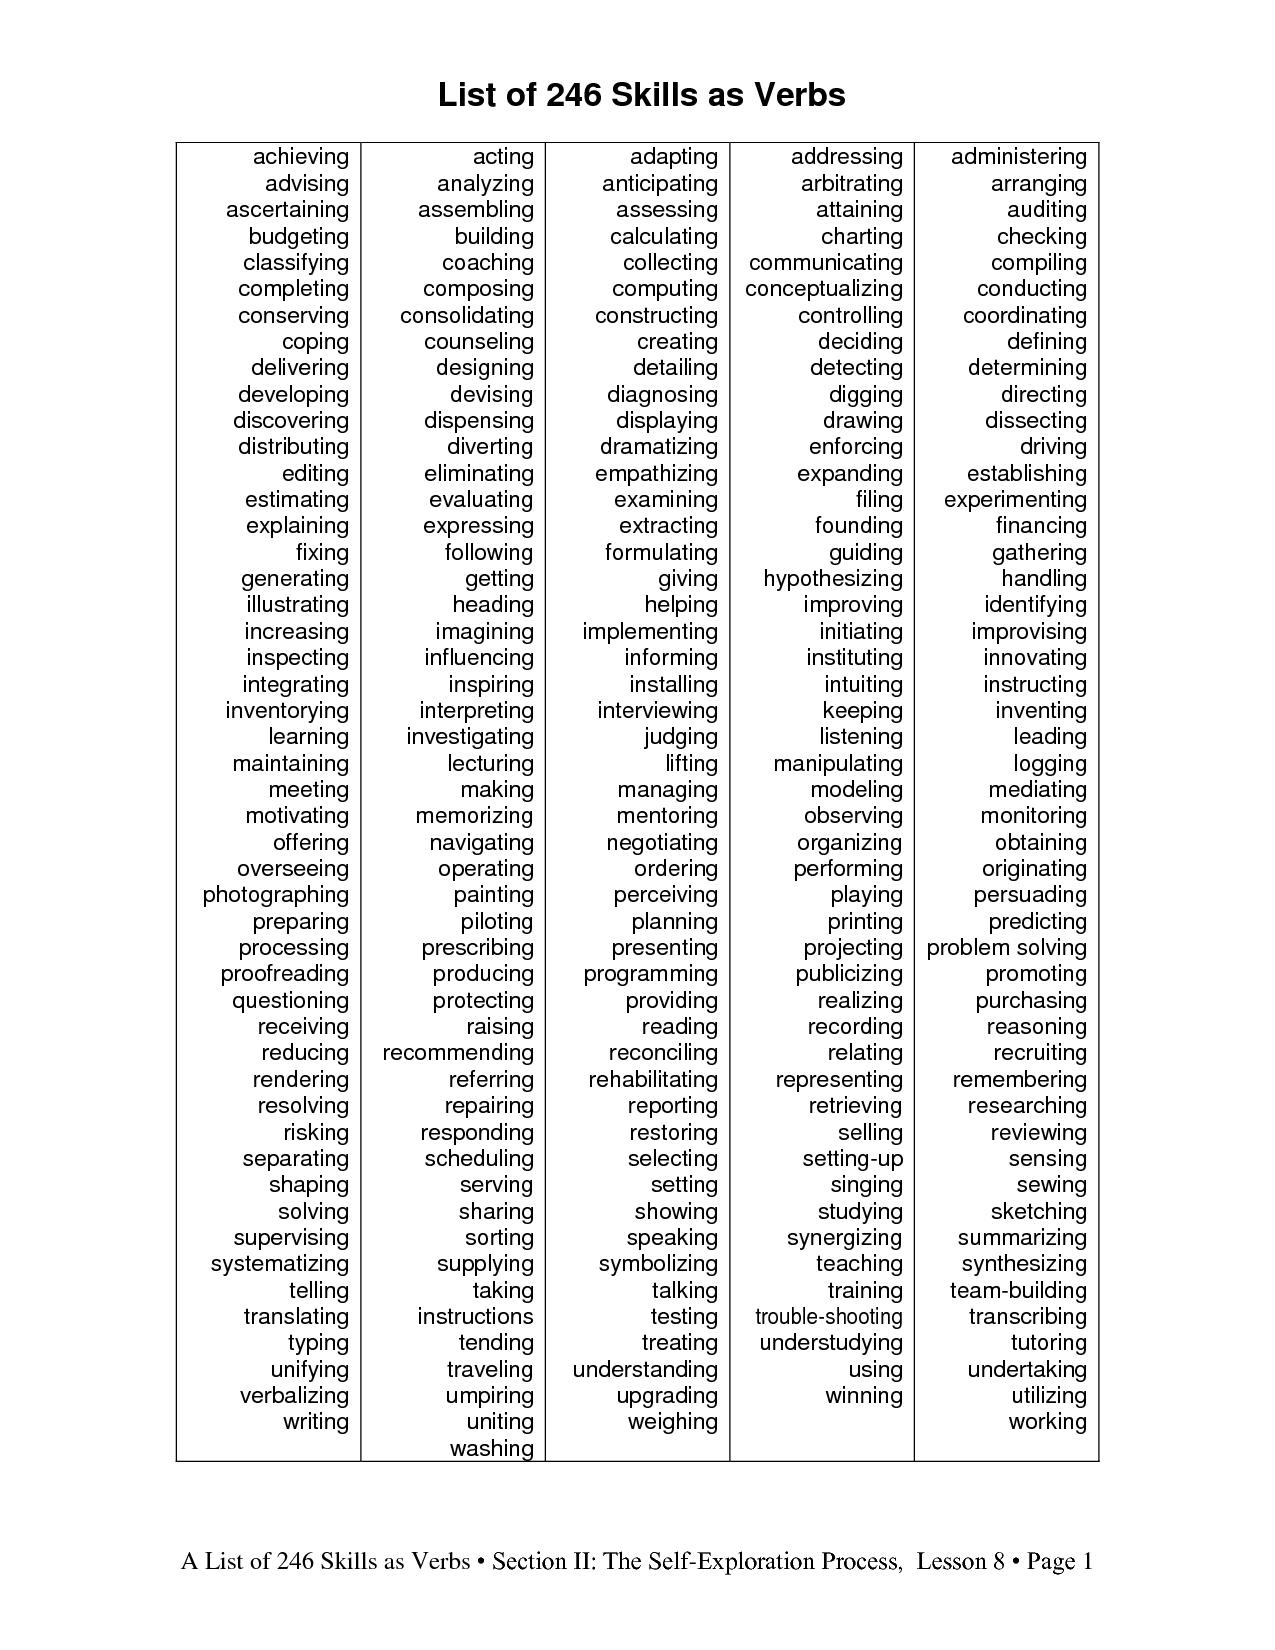 List Of Positive Coping Skills